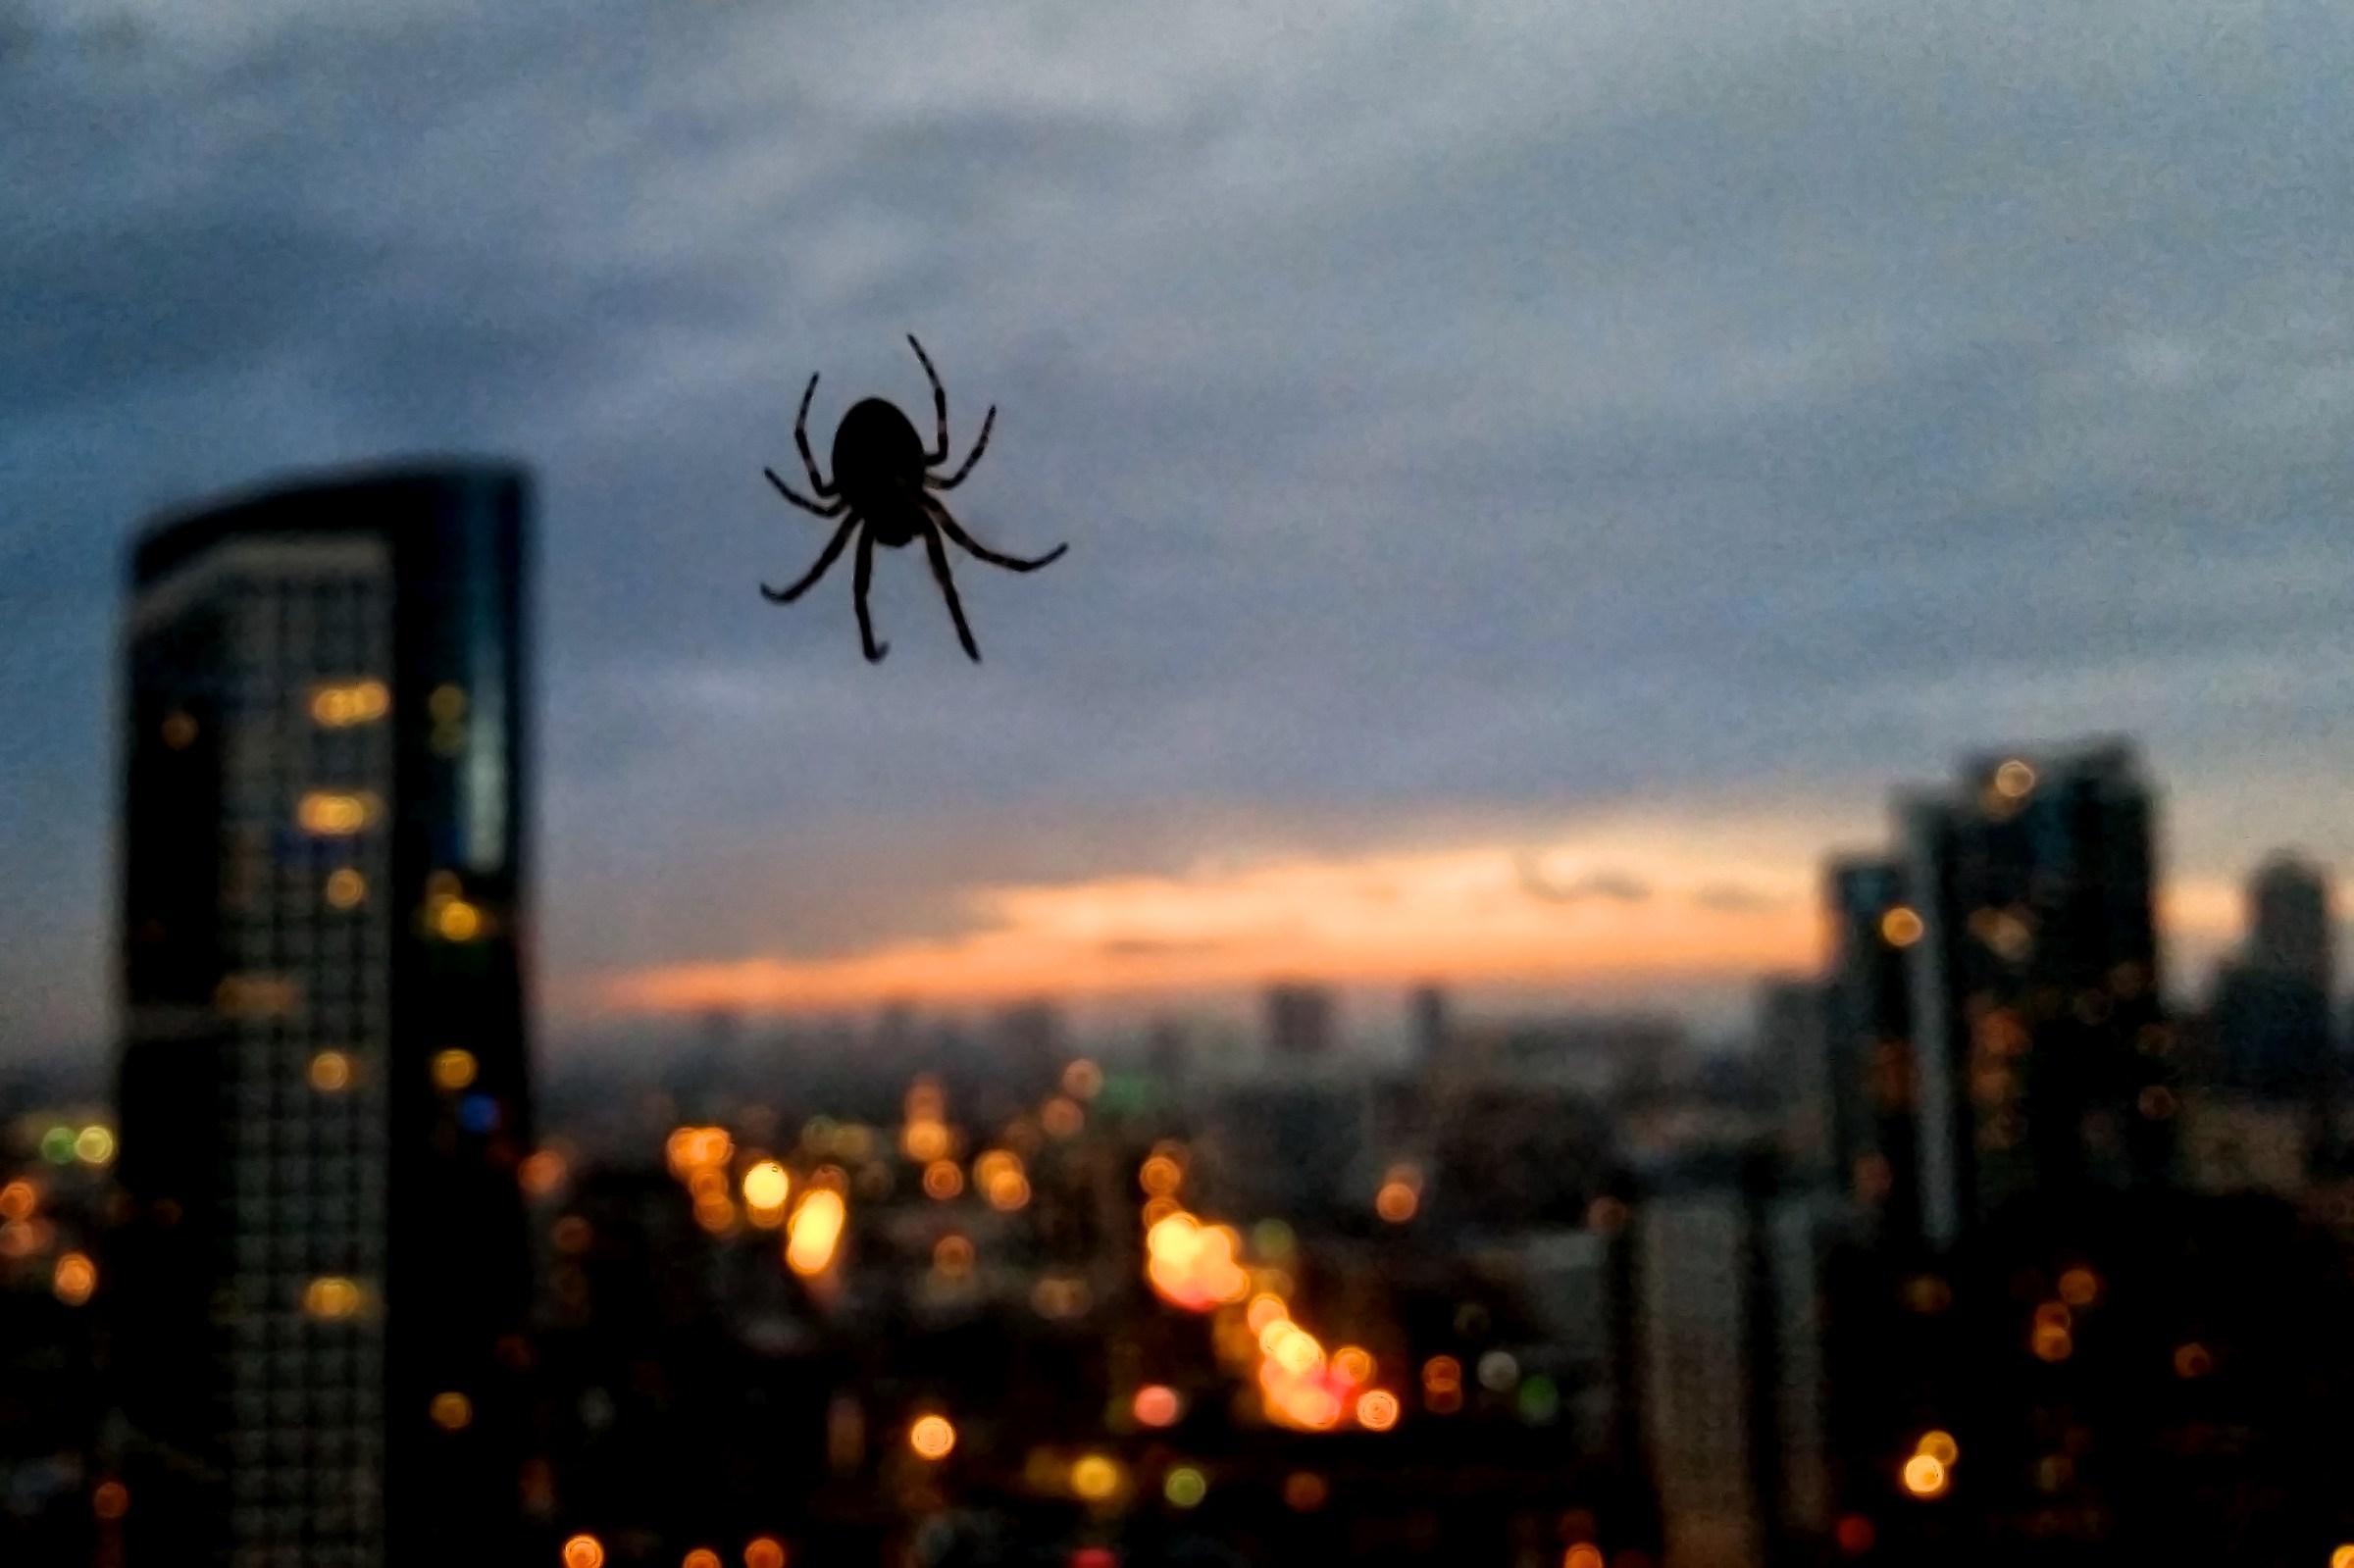 A spider on my window...